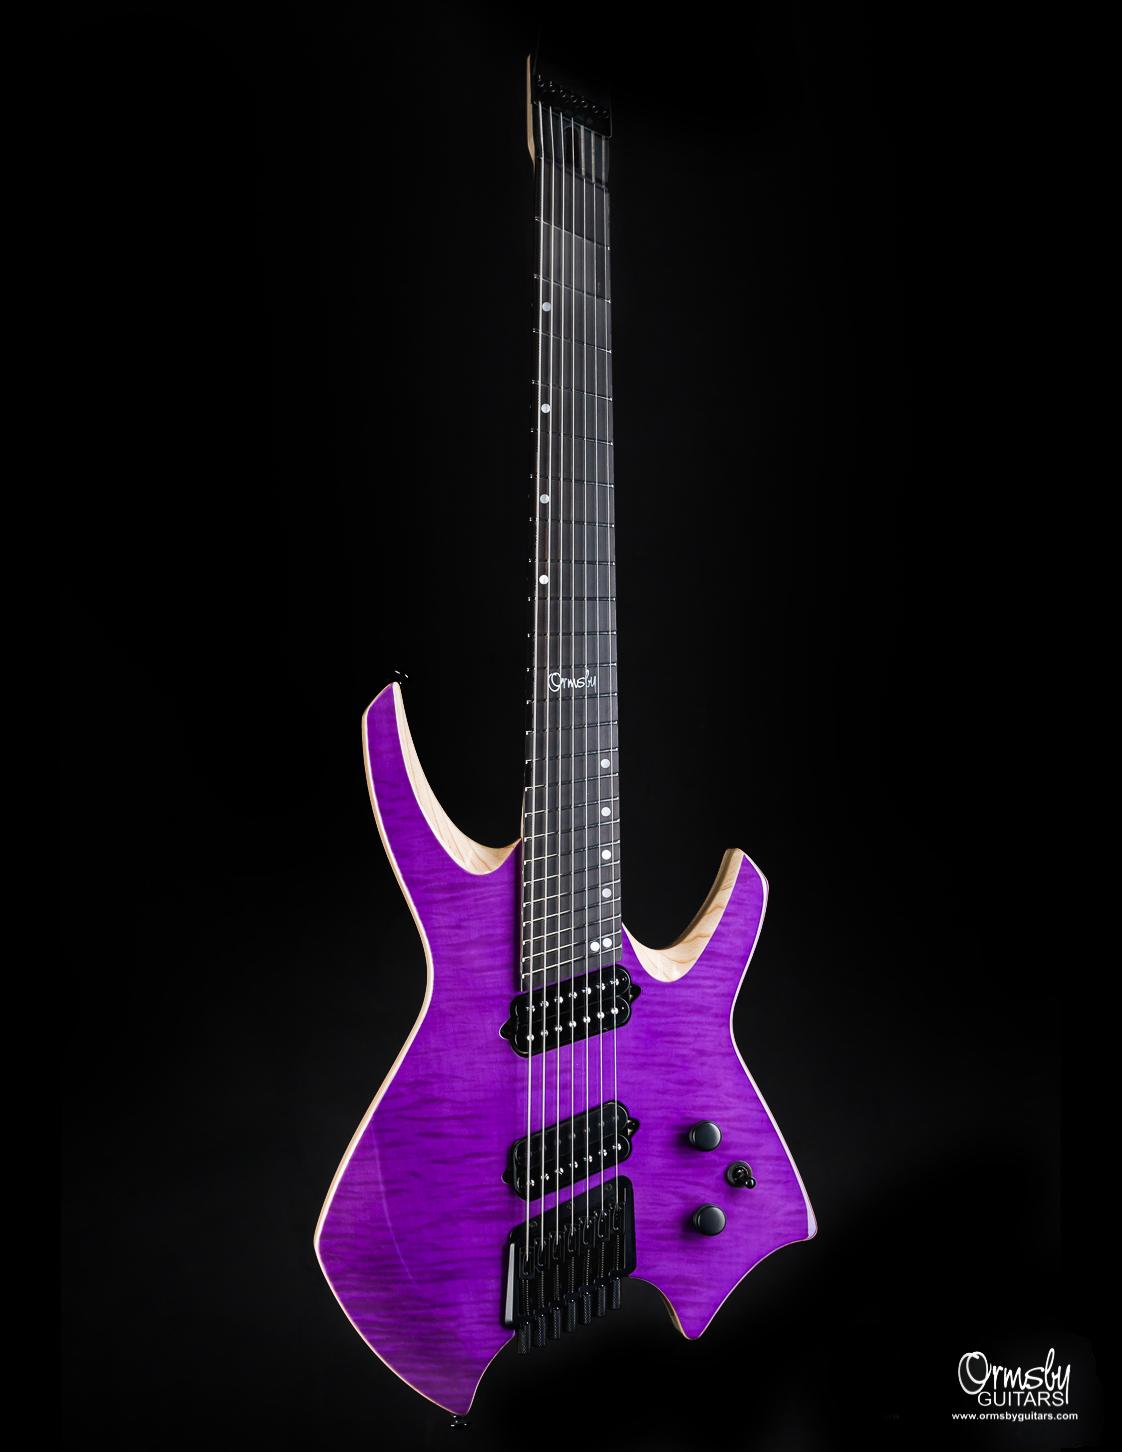 Ormsby Guitars Headless Goliath GTR